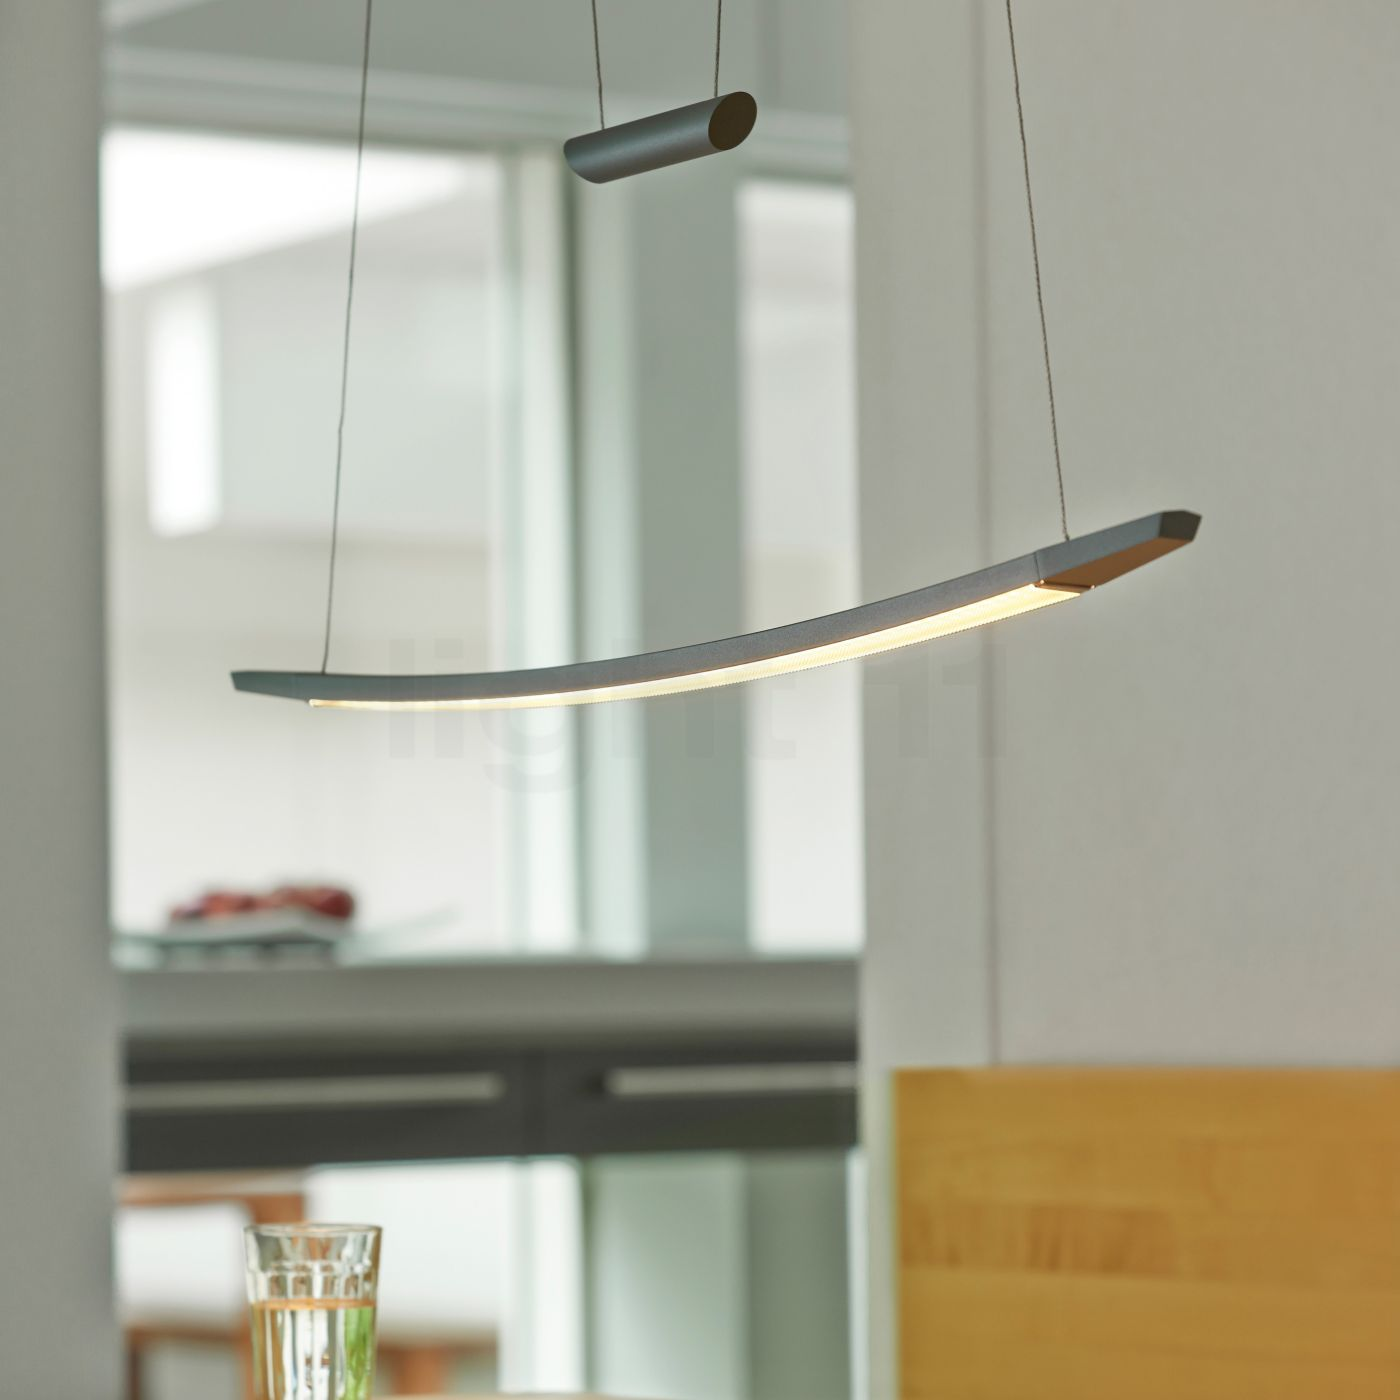 Oligo Lisgo Sky Short Hanglamp 2700 K kopen bij light11.nl